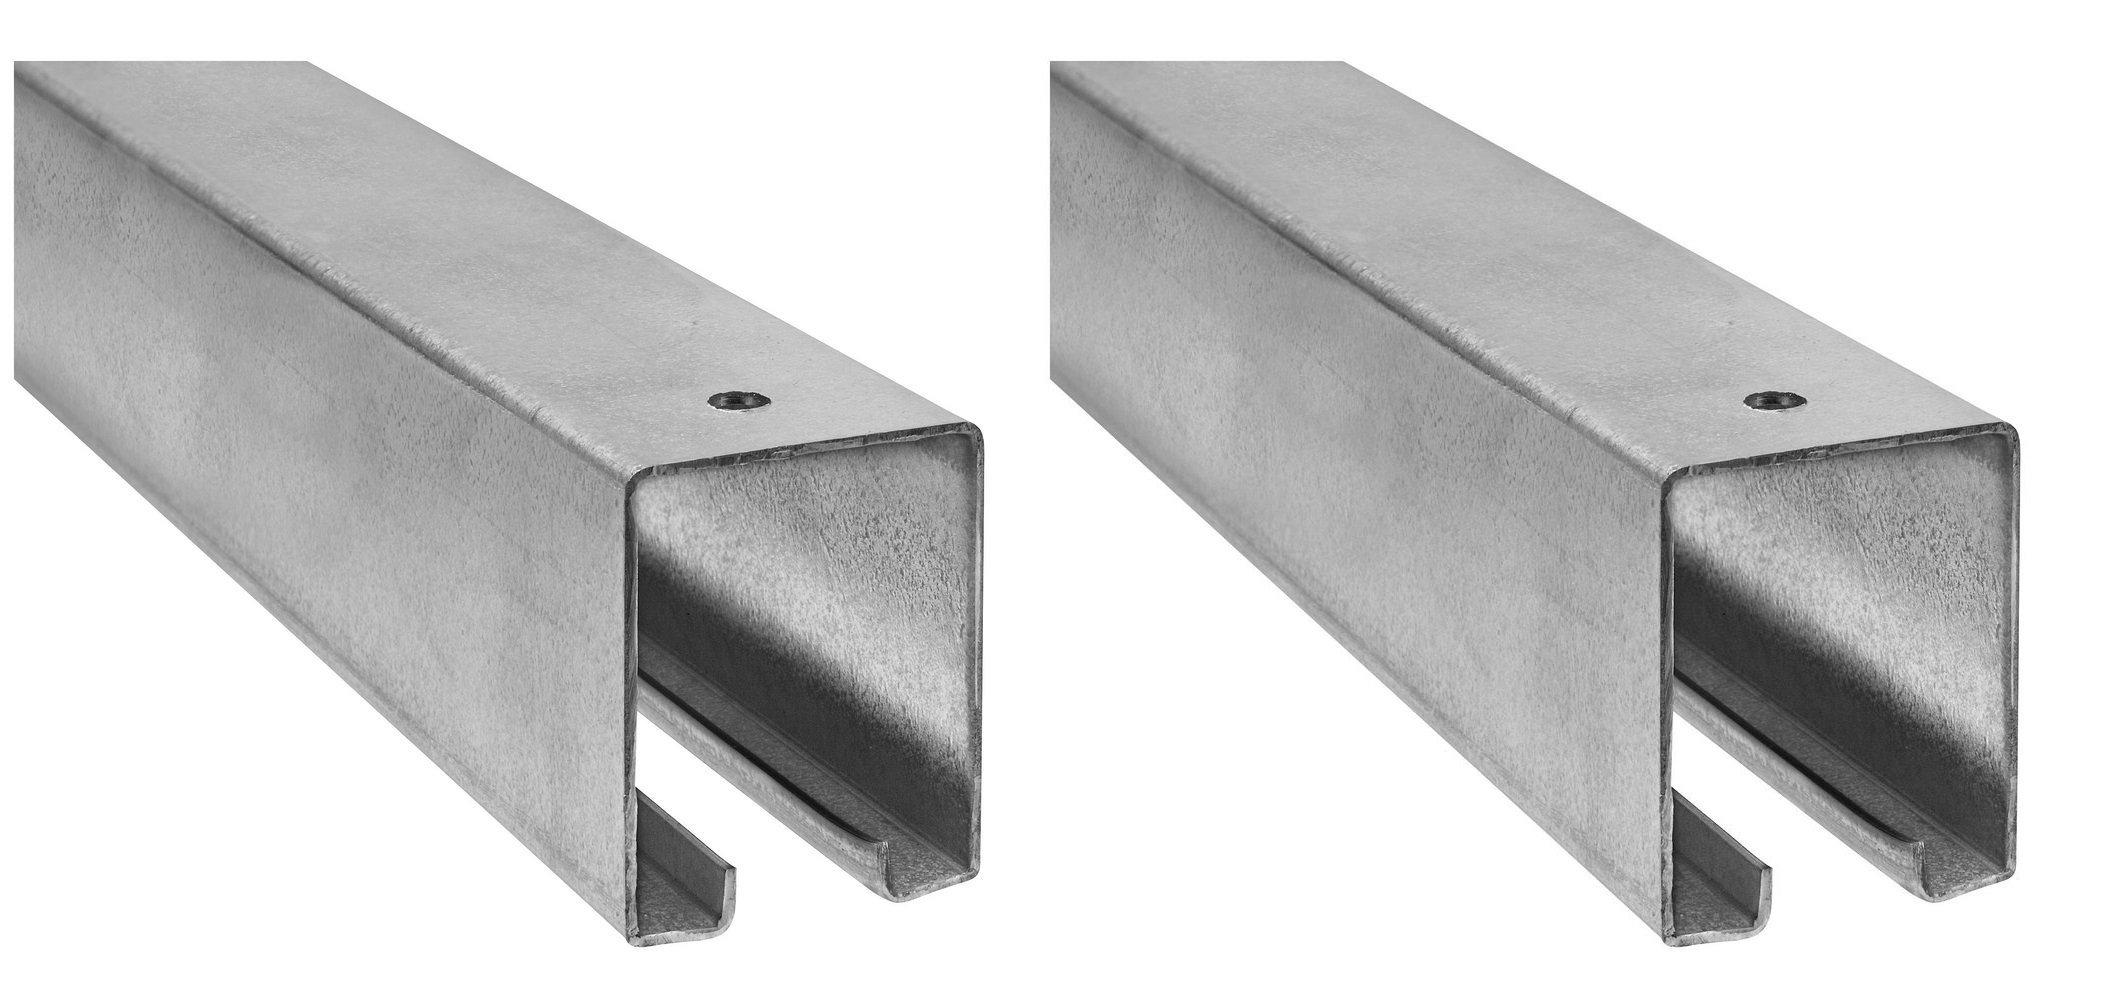 National Hardware N105-726 5116 Plain Box Rail in Galvanized, 8' (Pack of 2)